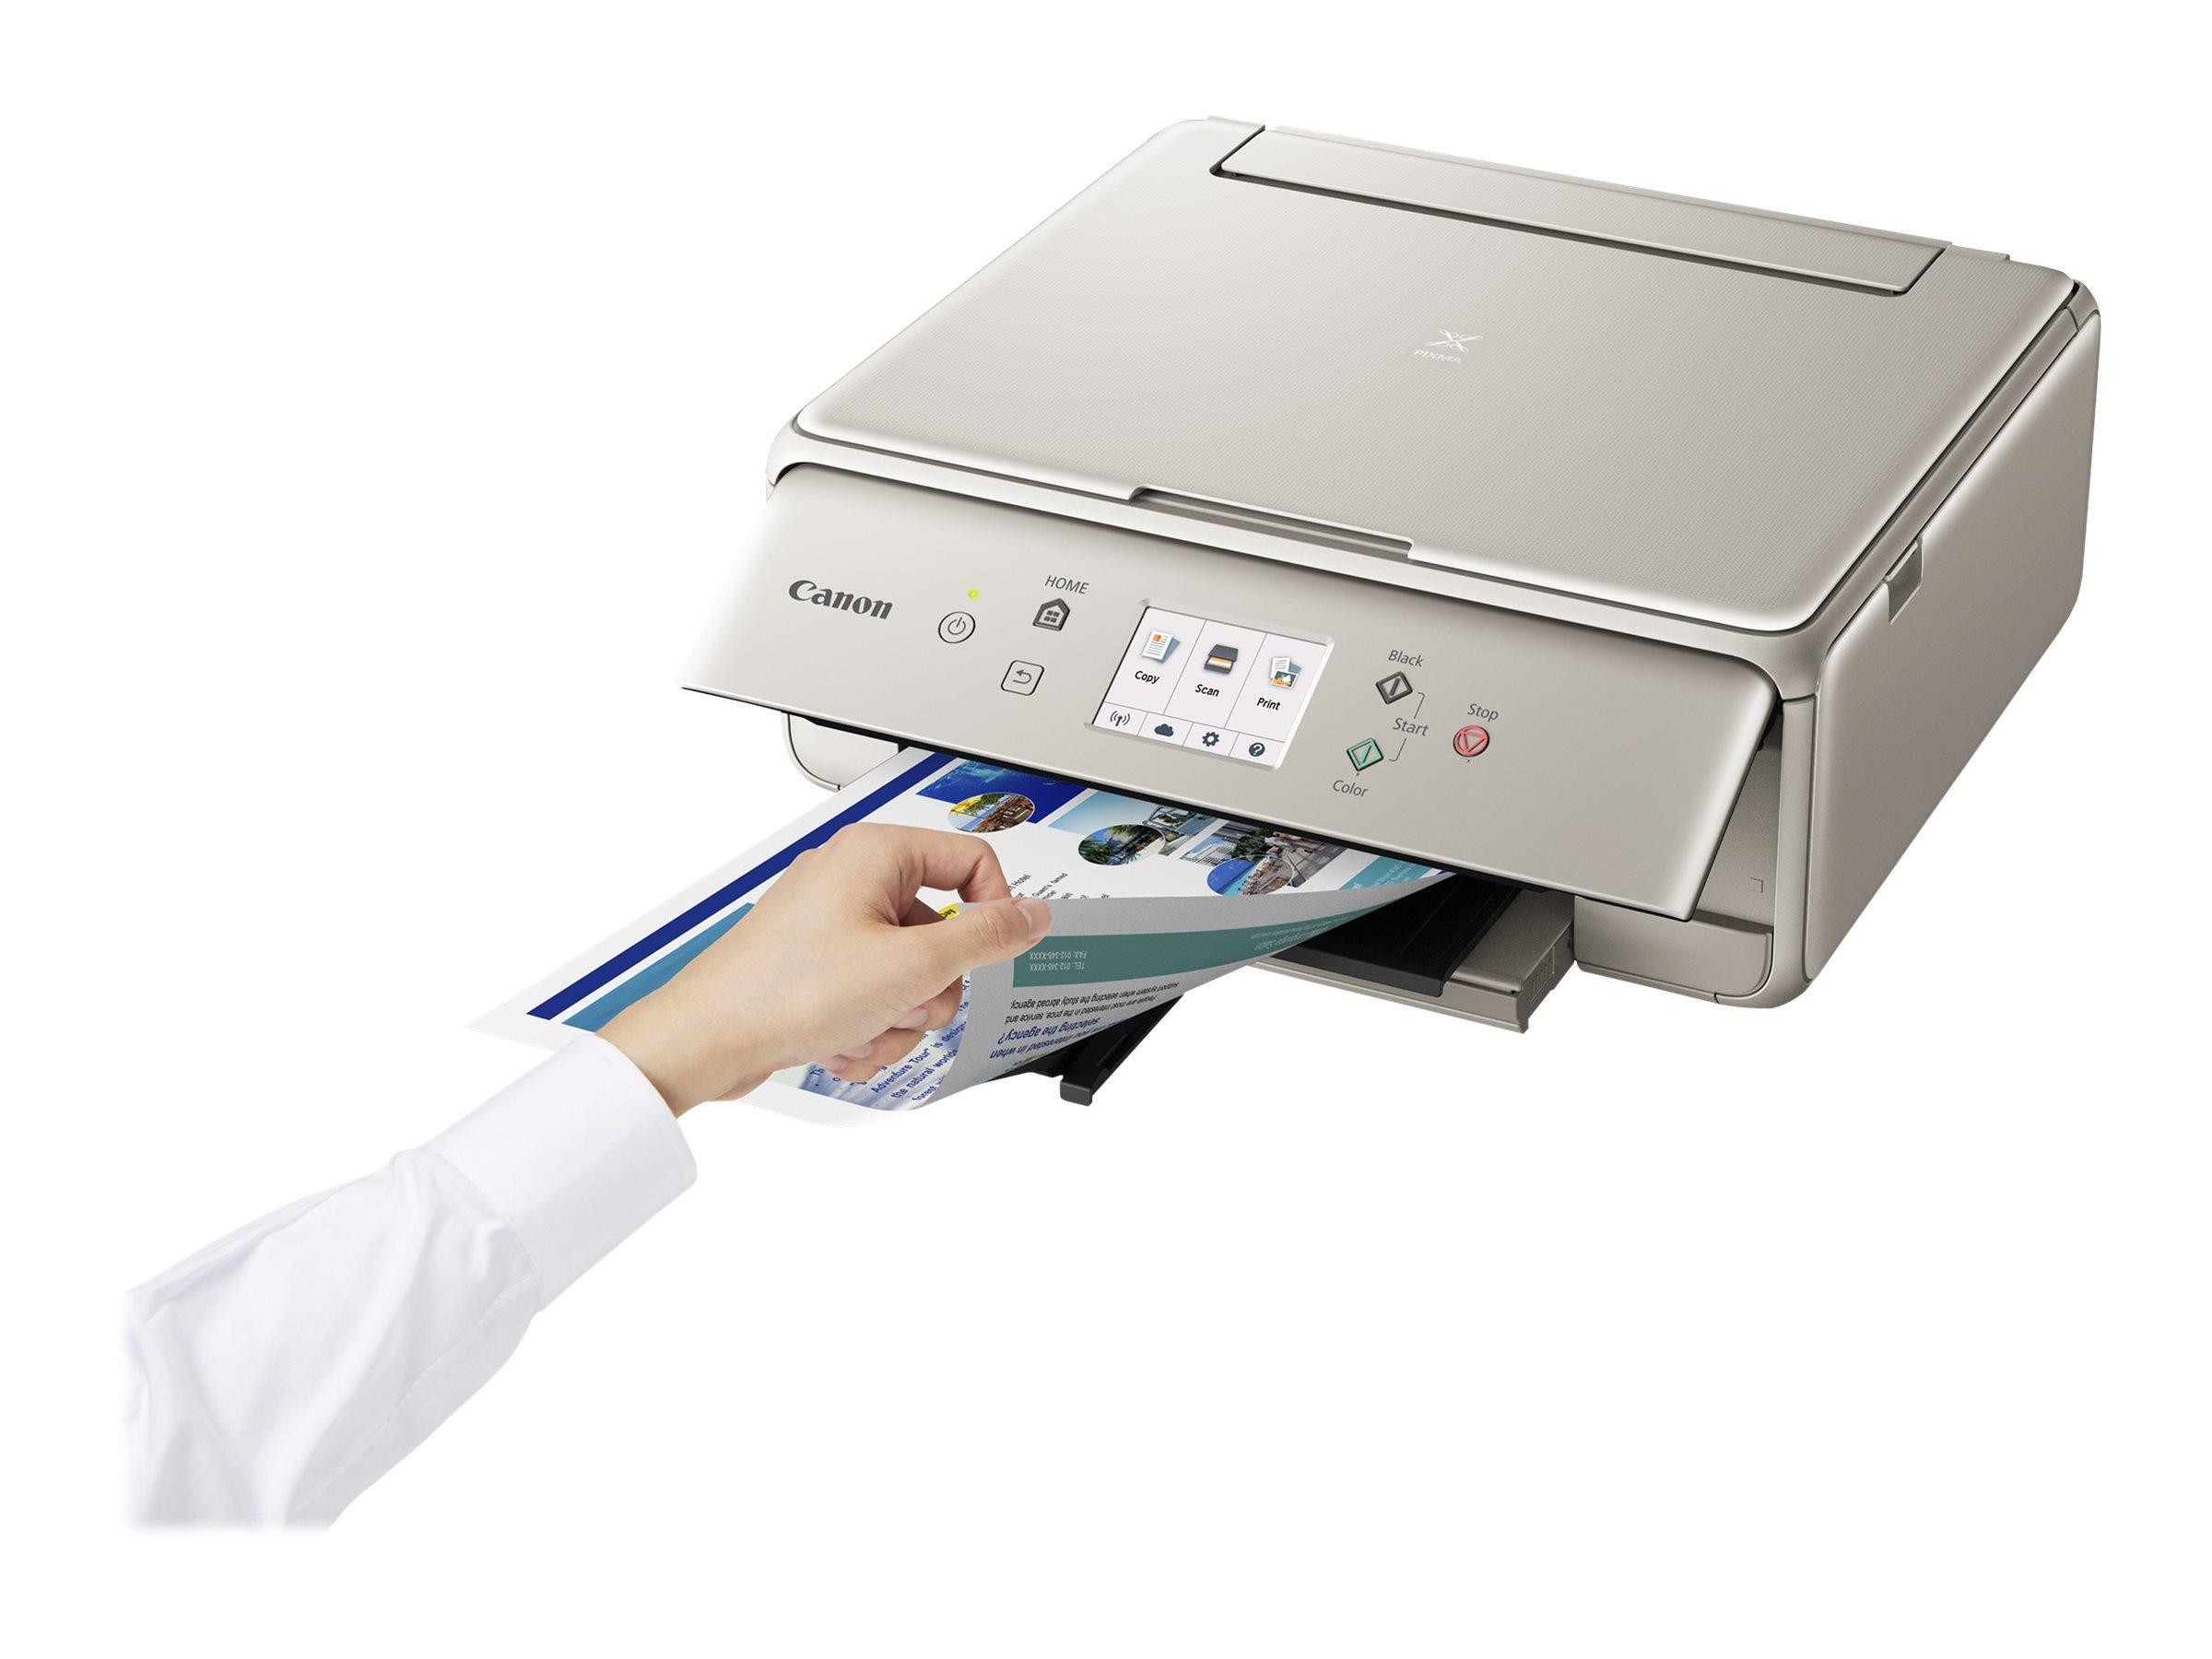 Canon PIXMA TS6052 - Multifunktionsdrucker - Farbe - Tintenstrahl - 216 x 297 mm (Original) - A4/Legal (Medien)